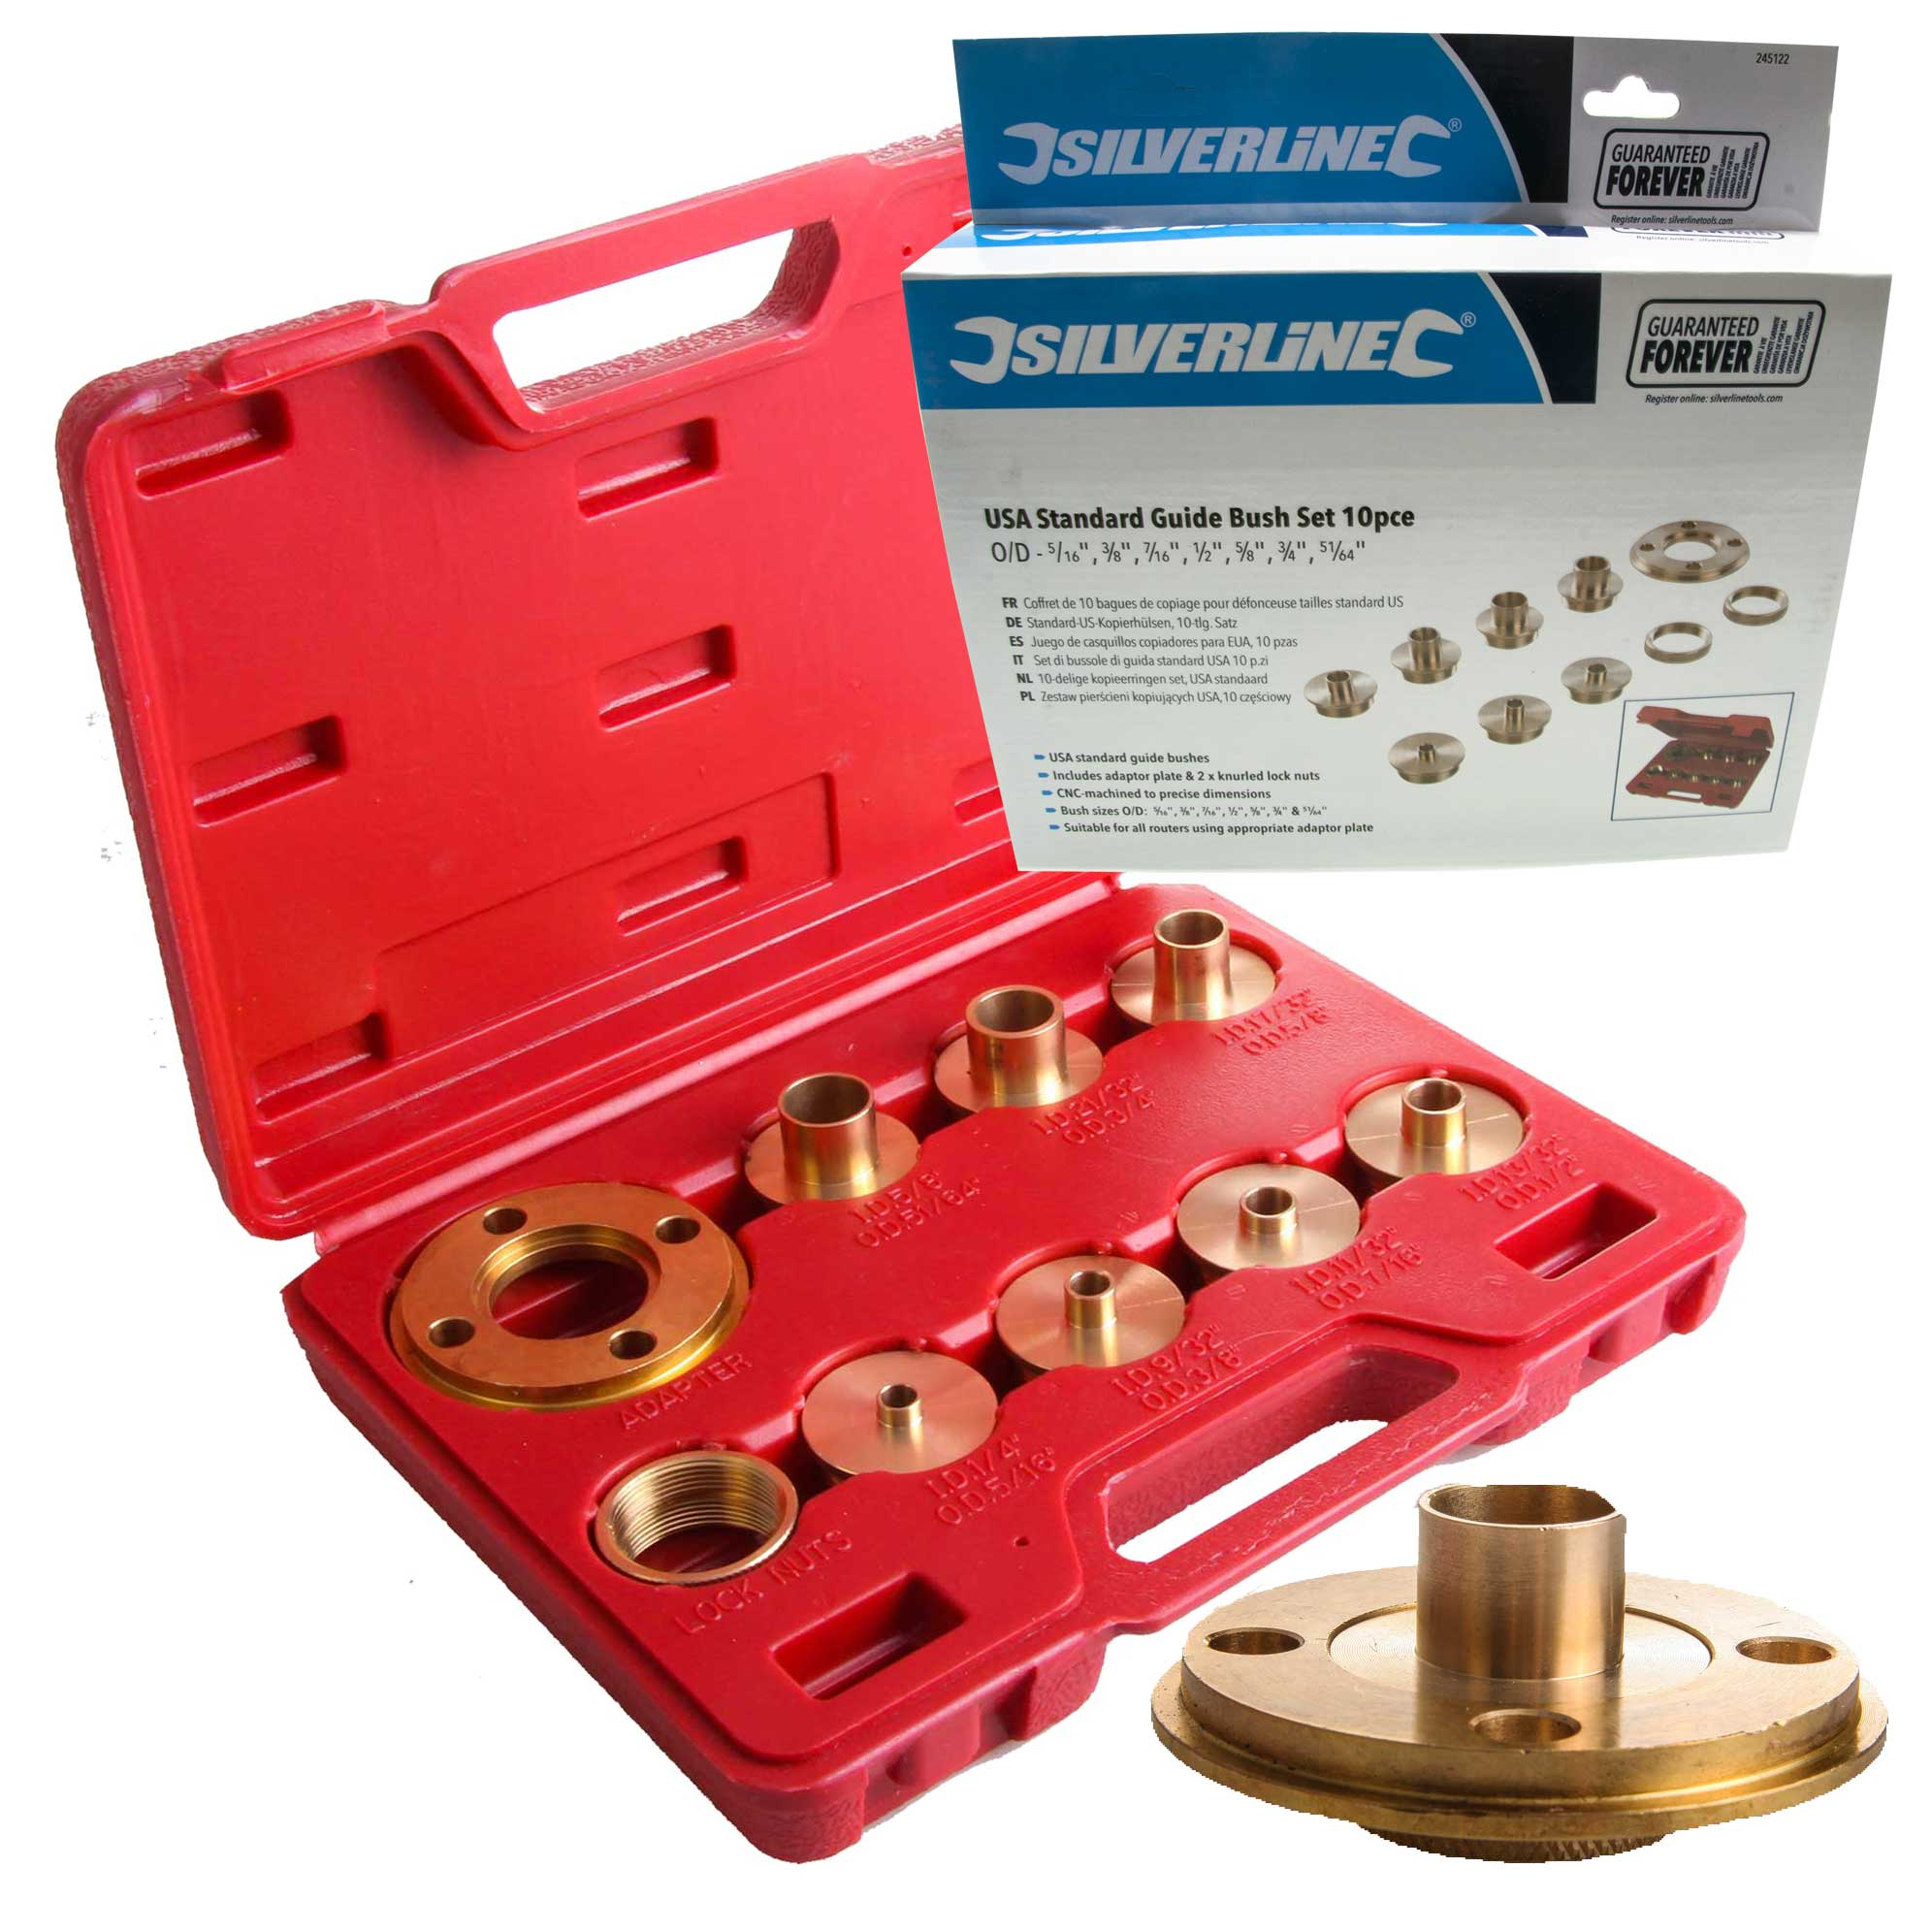 silverline 245122 10 piece guide bush set for routers silverline